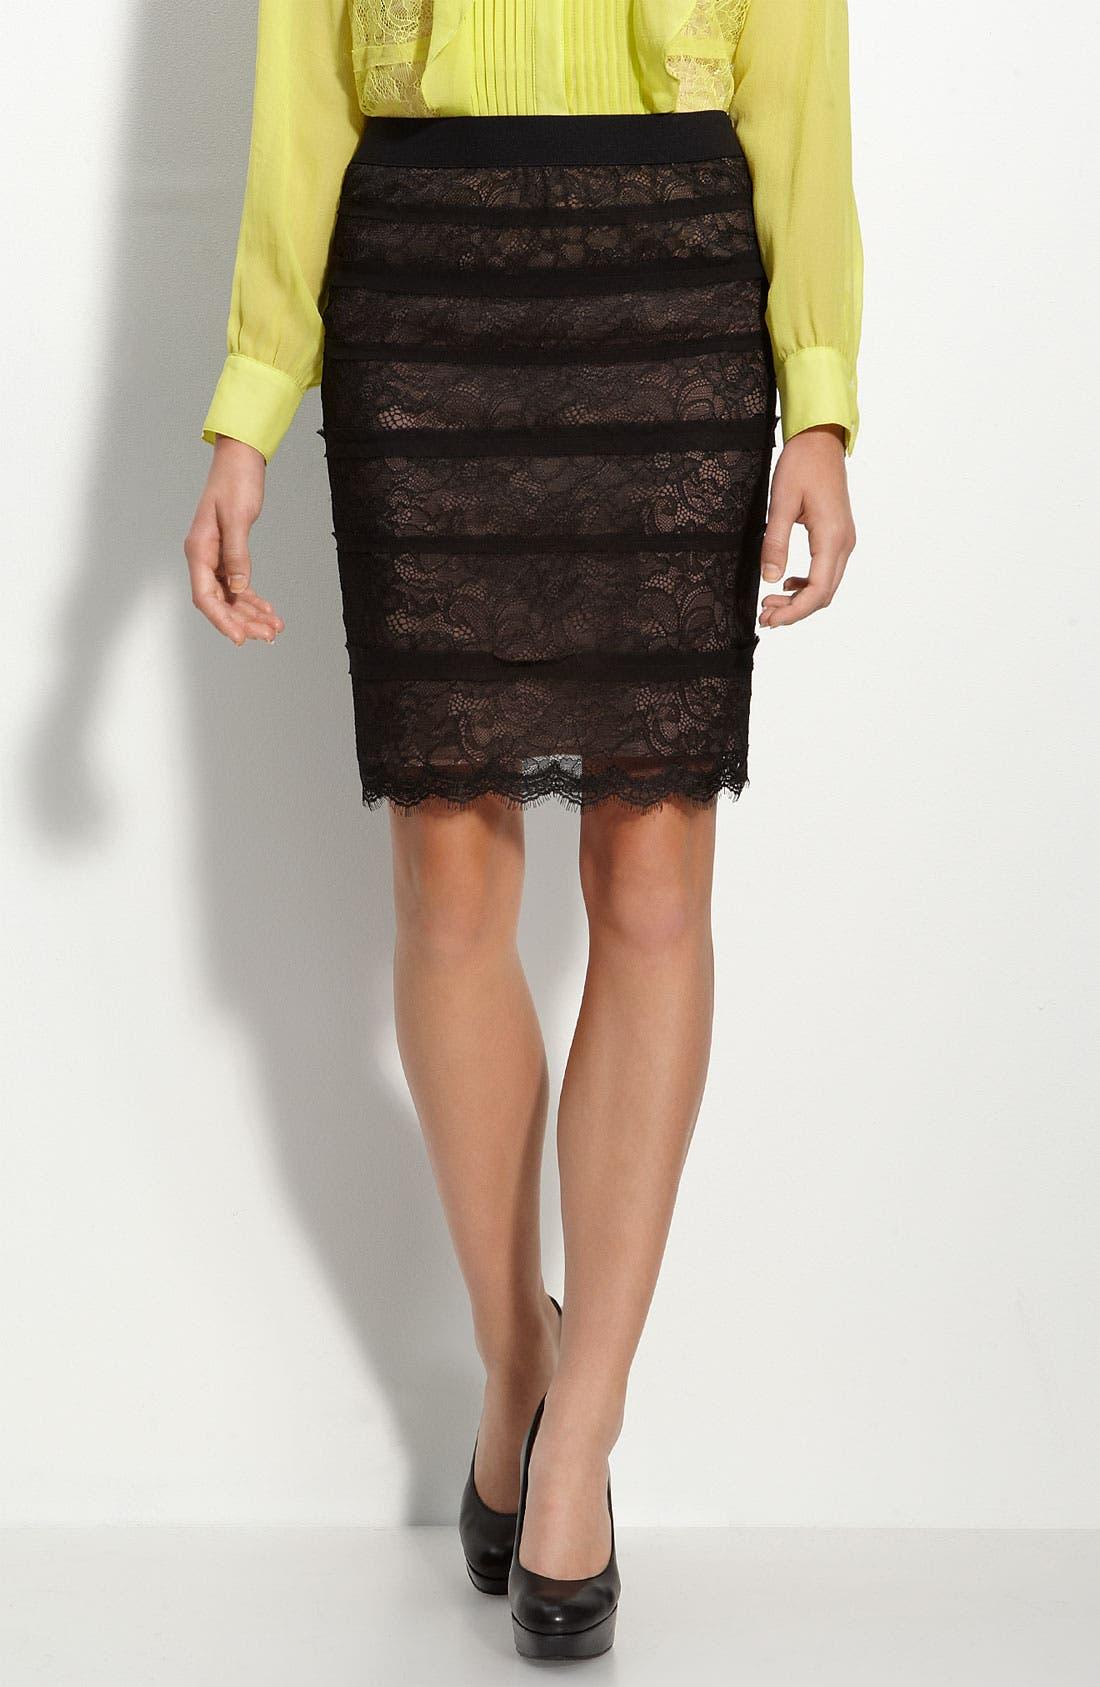 Main Image - BCBGMAXAZRIA 'Jocelyn' Lace Pencil Skirt